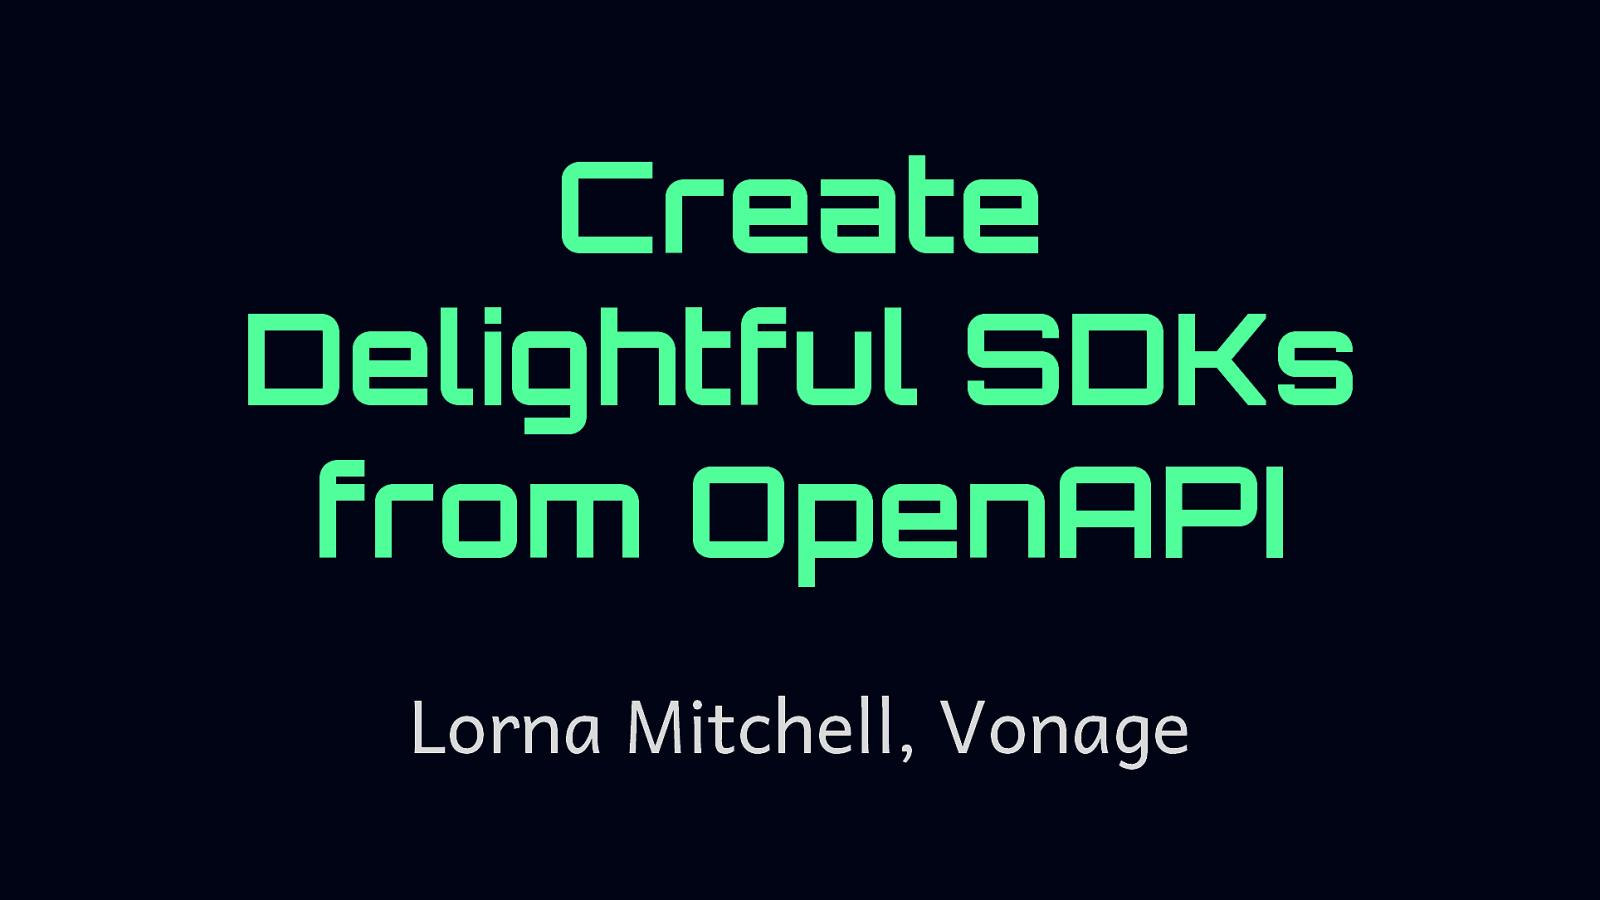 Create Delightful SDKs with OpenAPI